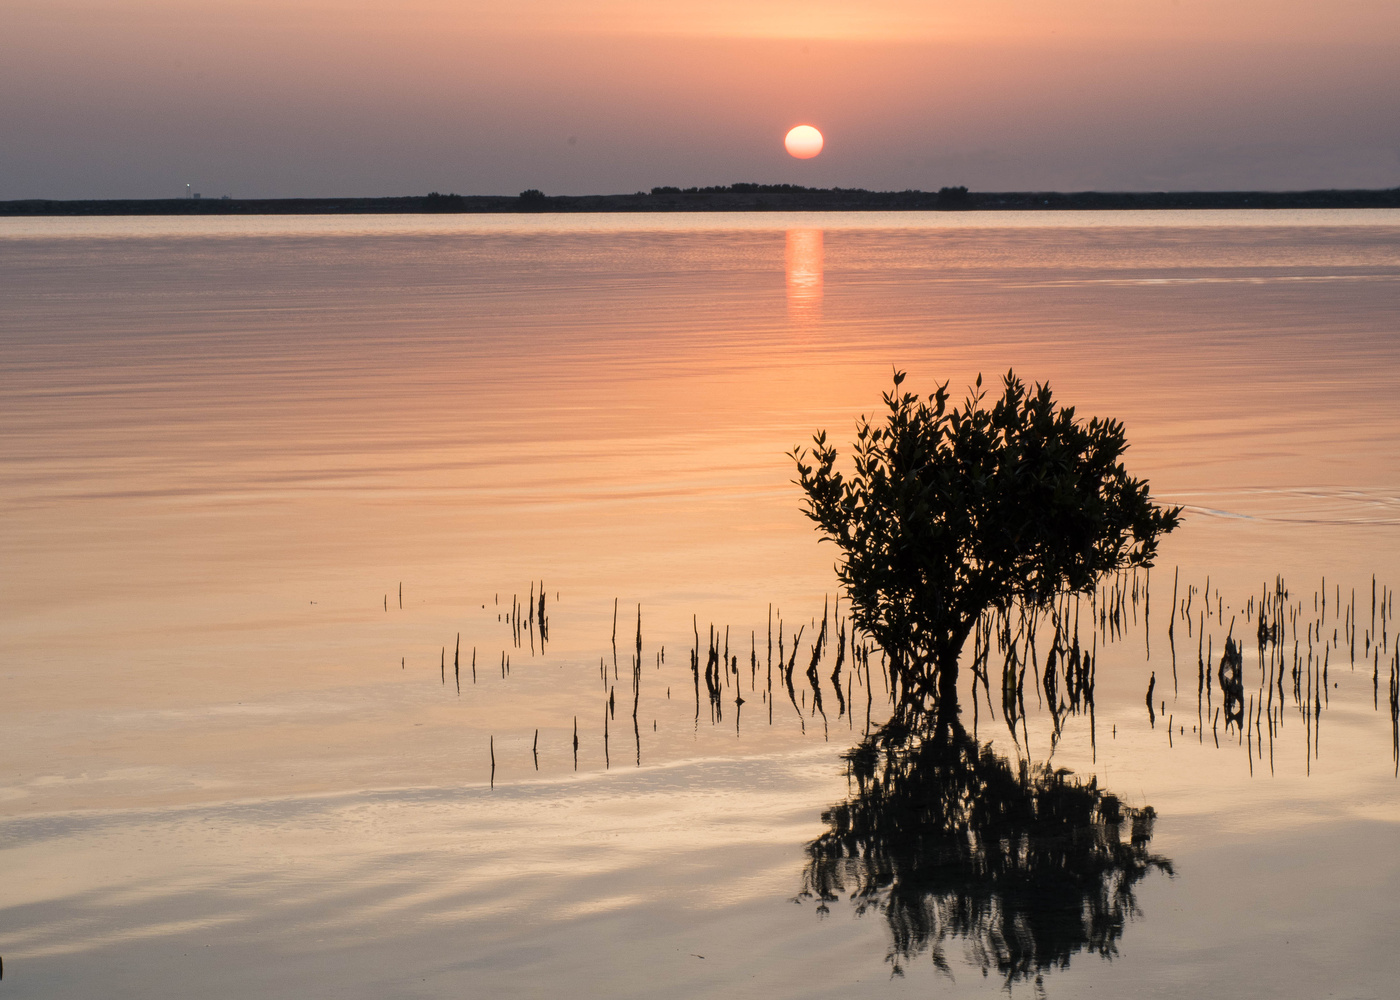 Sunrise at Mirfa by Ron Cunningham